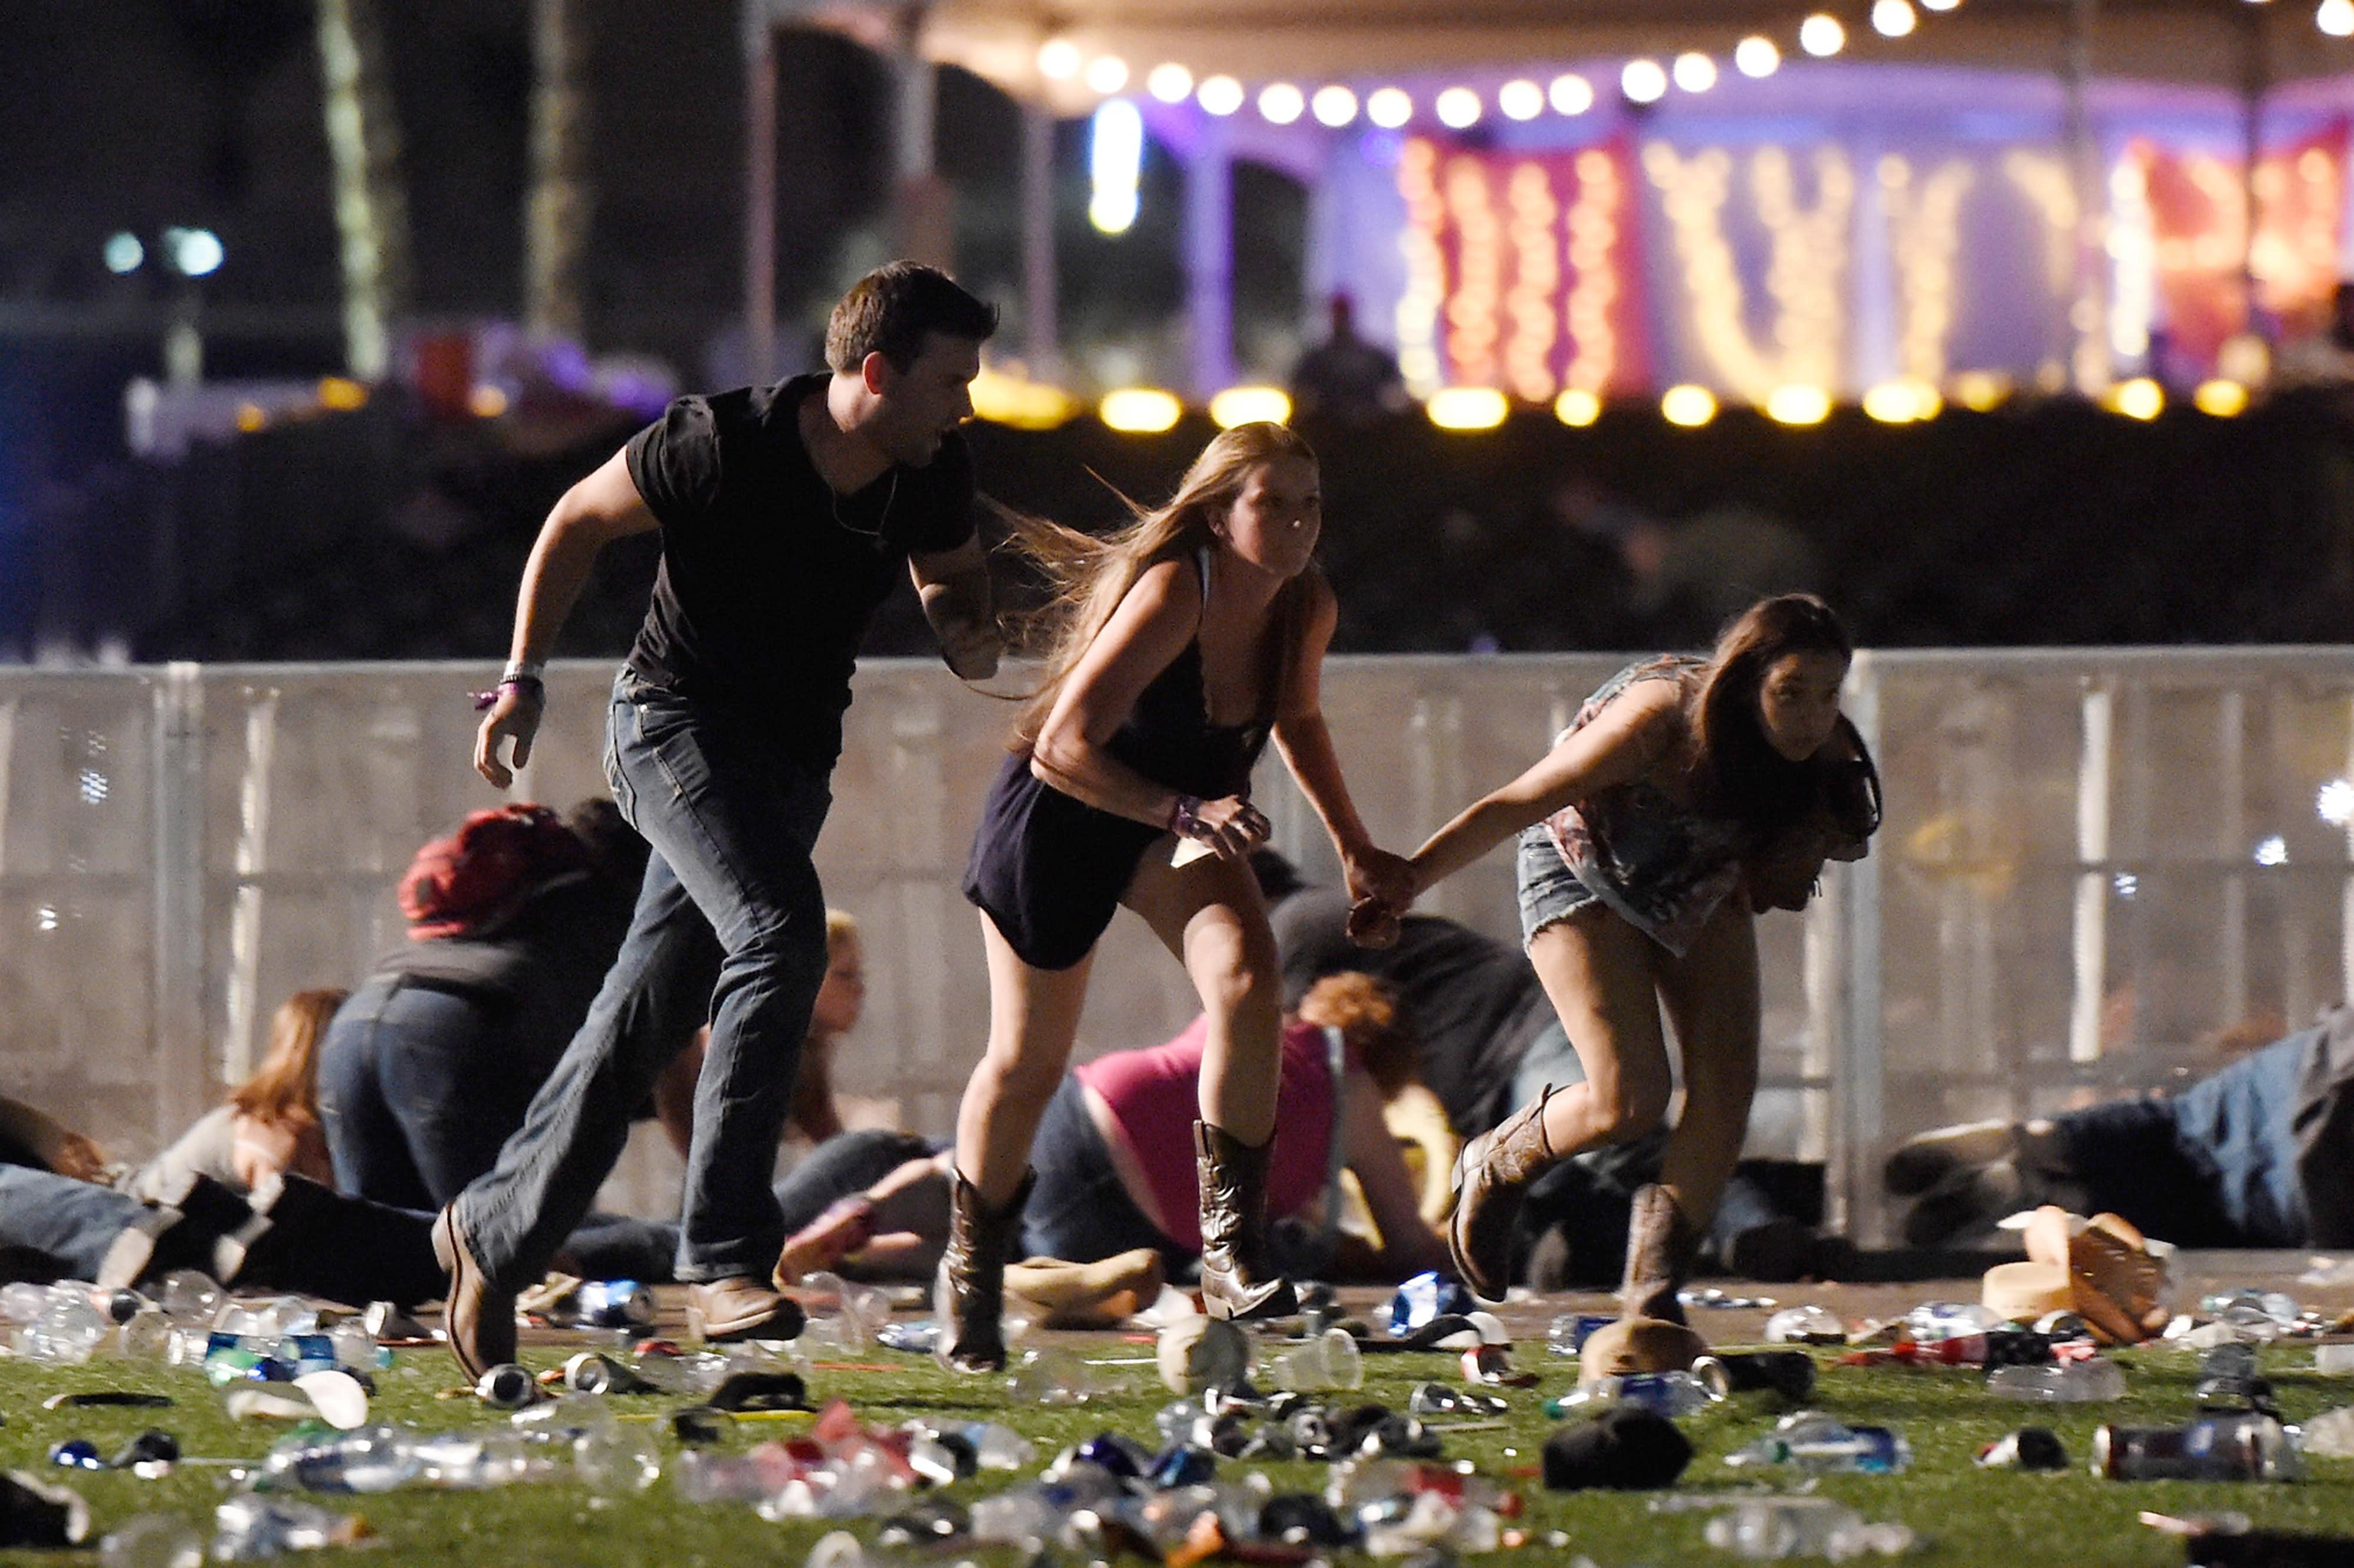 Las Vegas Gunman Had Cameras Set Up Inside Hotel Room During Shooting